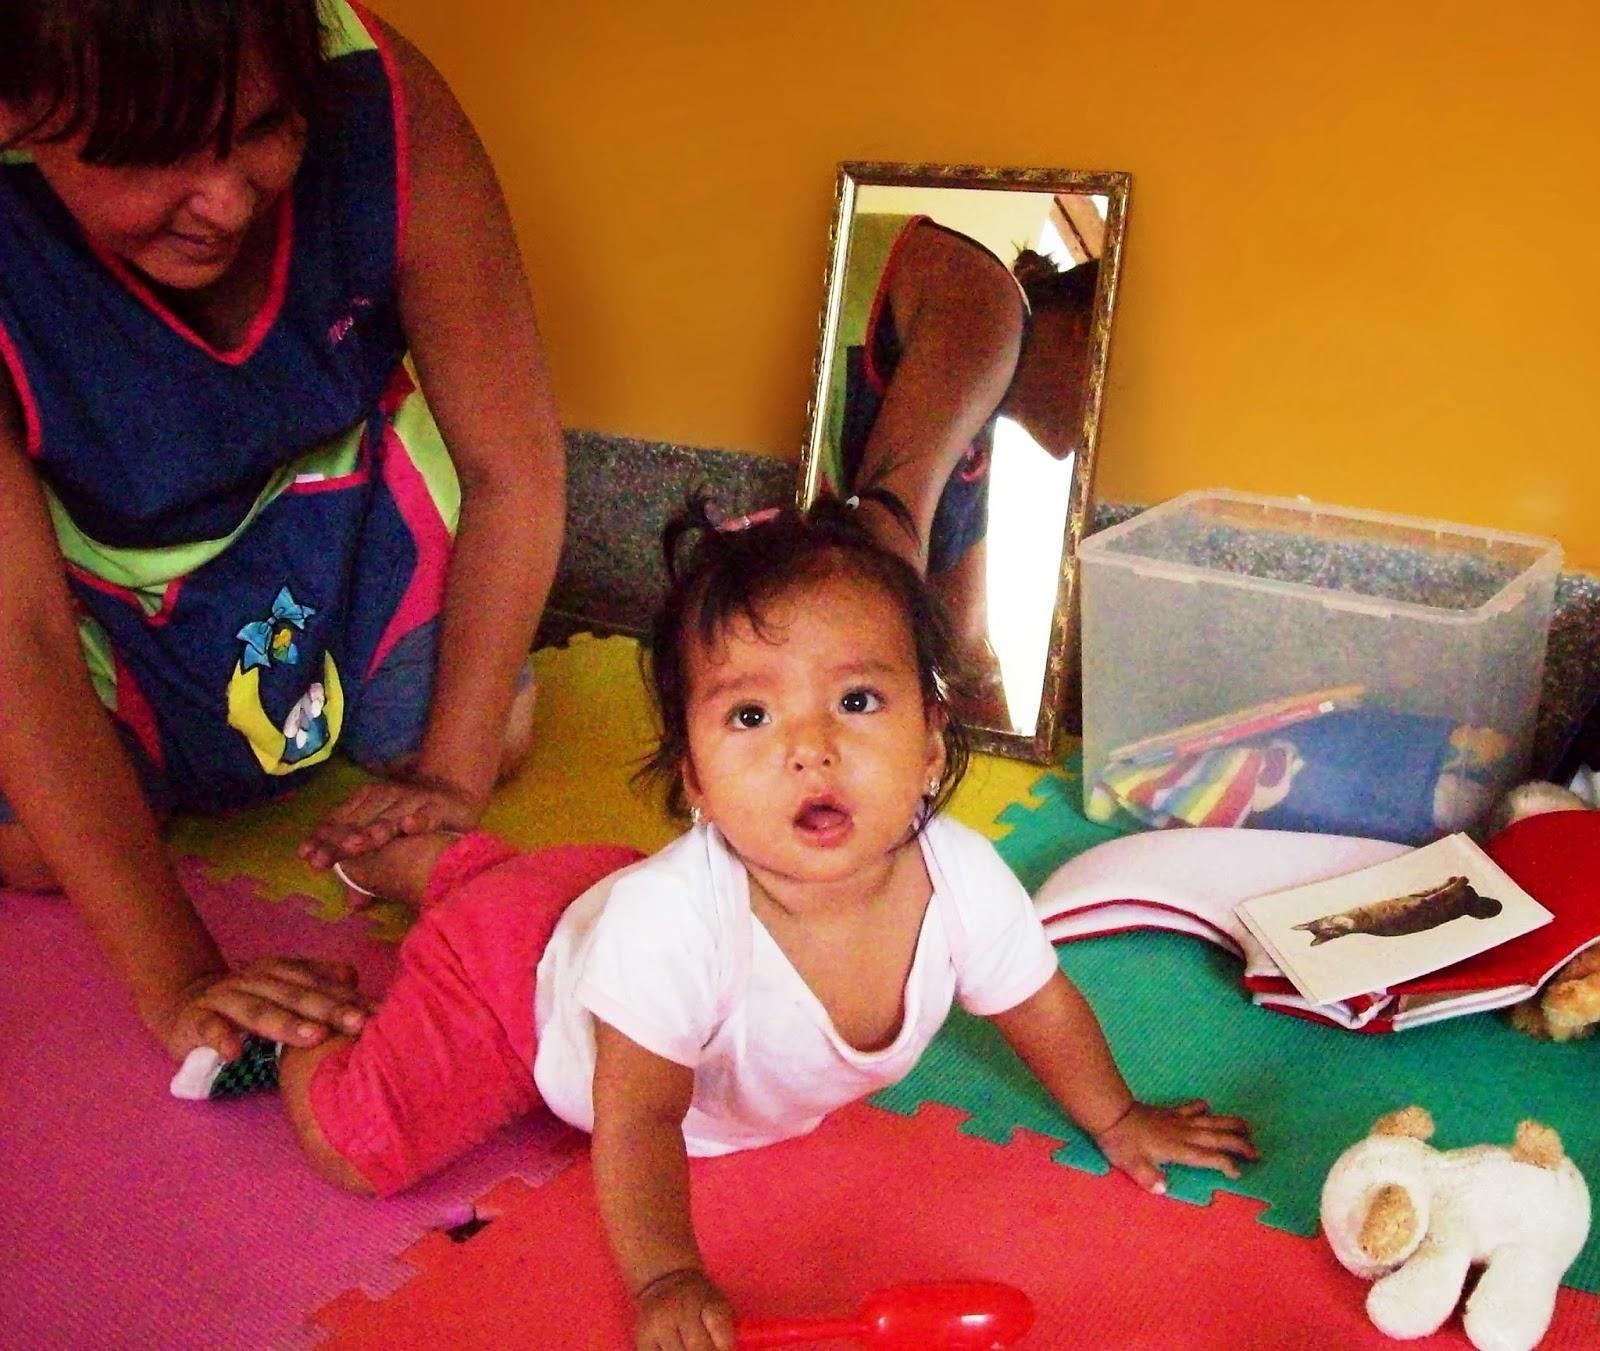 Blog mis peque os pasos la importancia de gatear - Moqueta para ninos ...